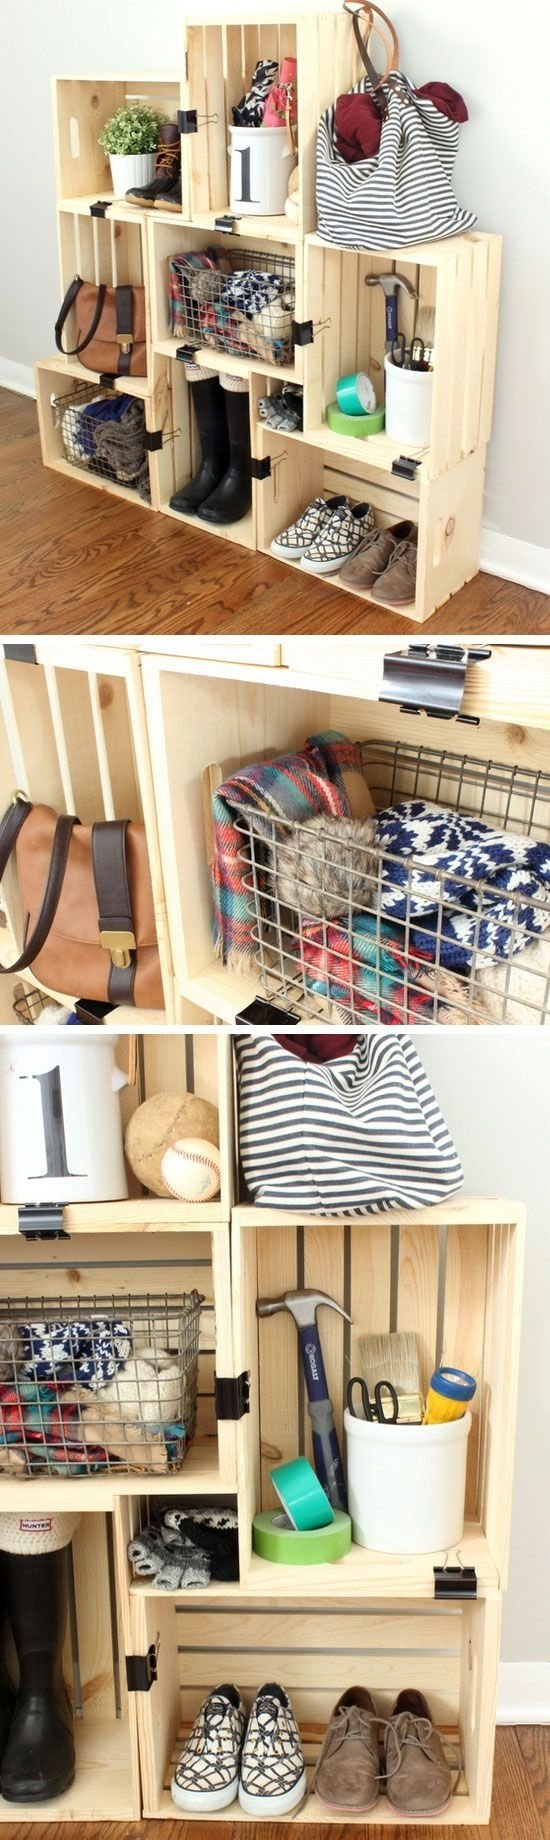 10 Gorgeous Organization Ideas For Small Apartments small apartment organization internetunblock internetunblock 2021